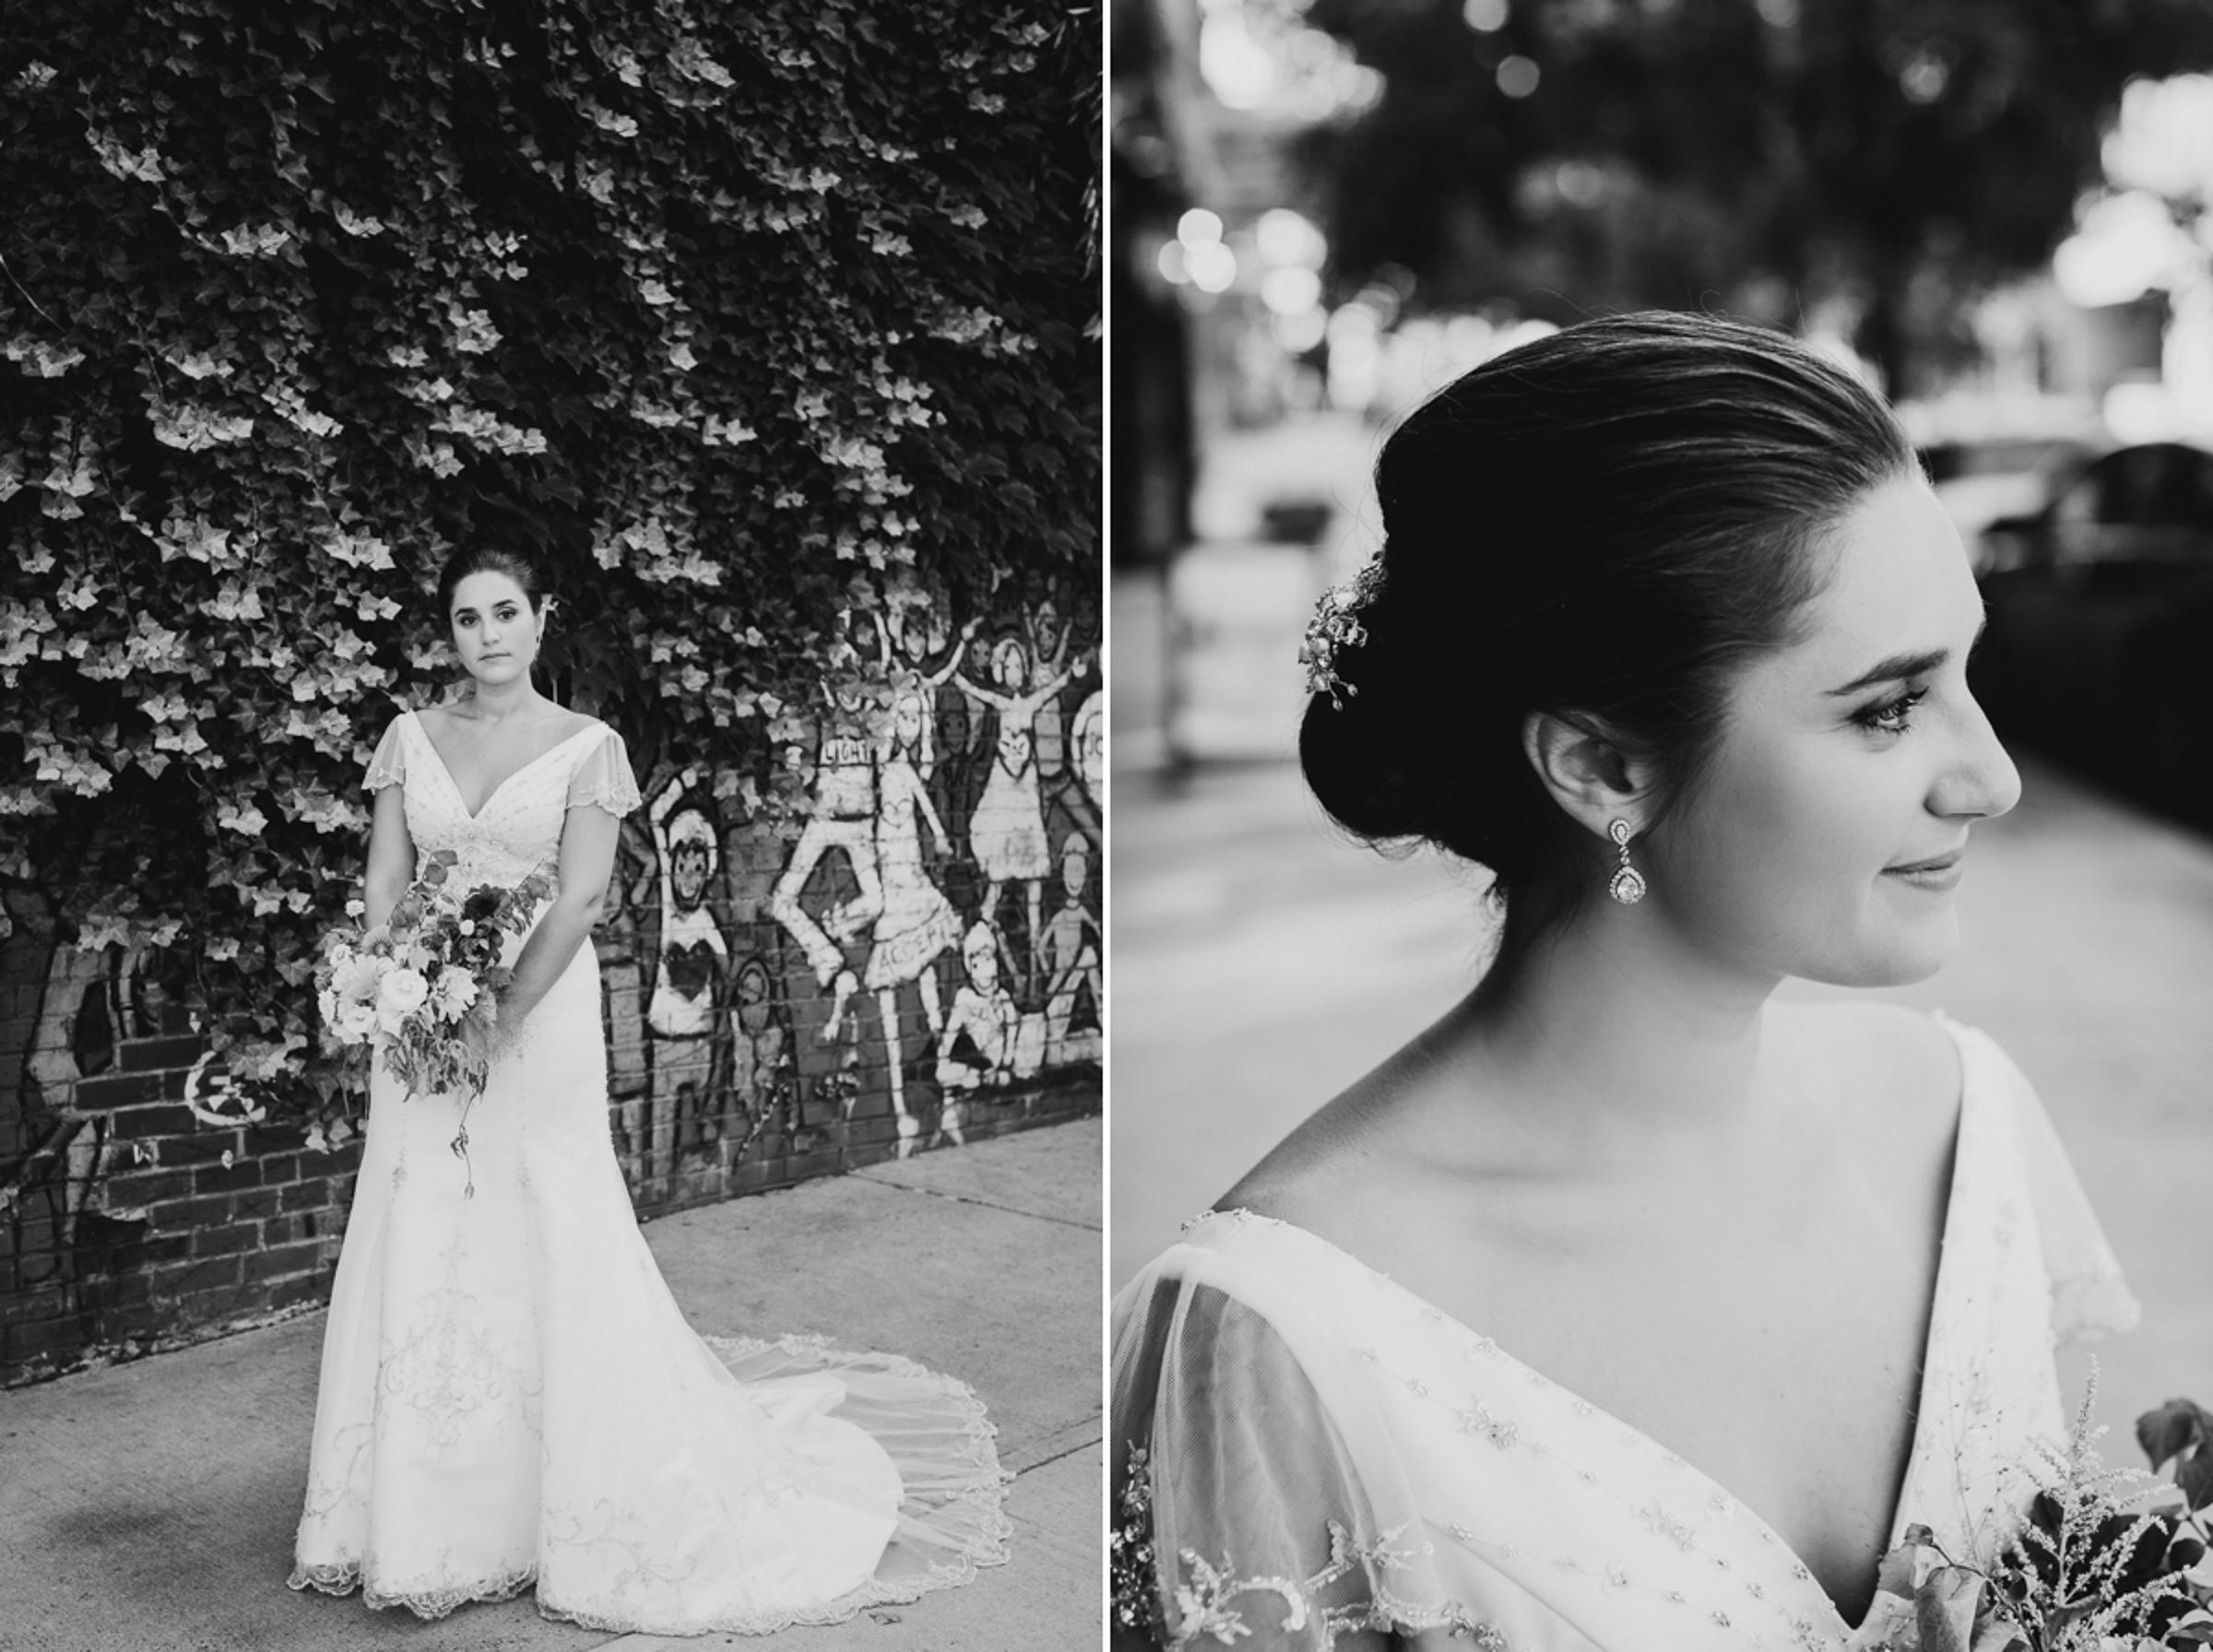 Brooklyn-Winery-NYC-Editorial-Documentary-Wedding-Photographer-Gina-Oli-122.jpg